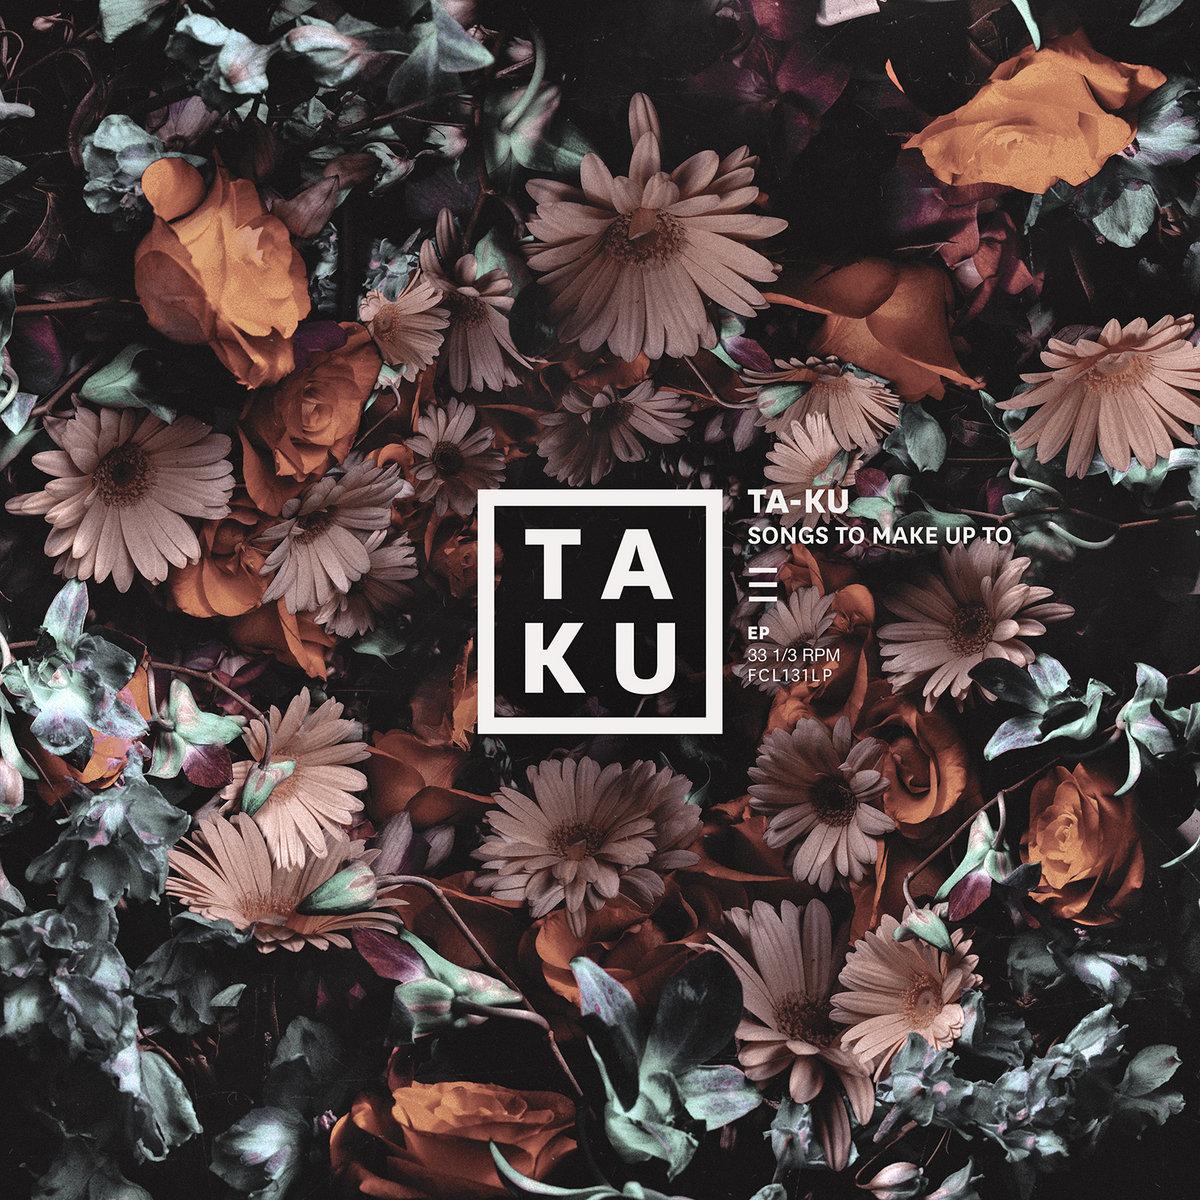 Songs To Make Up To Taku